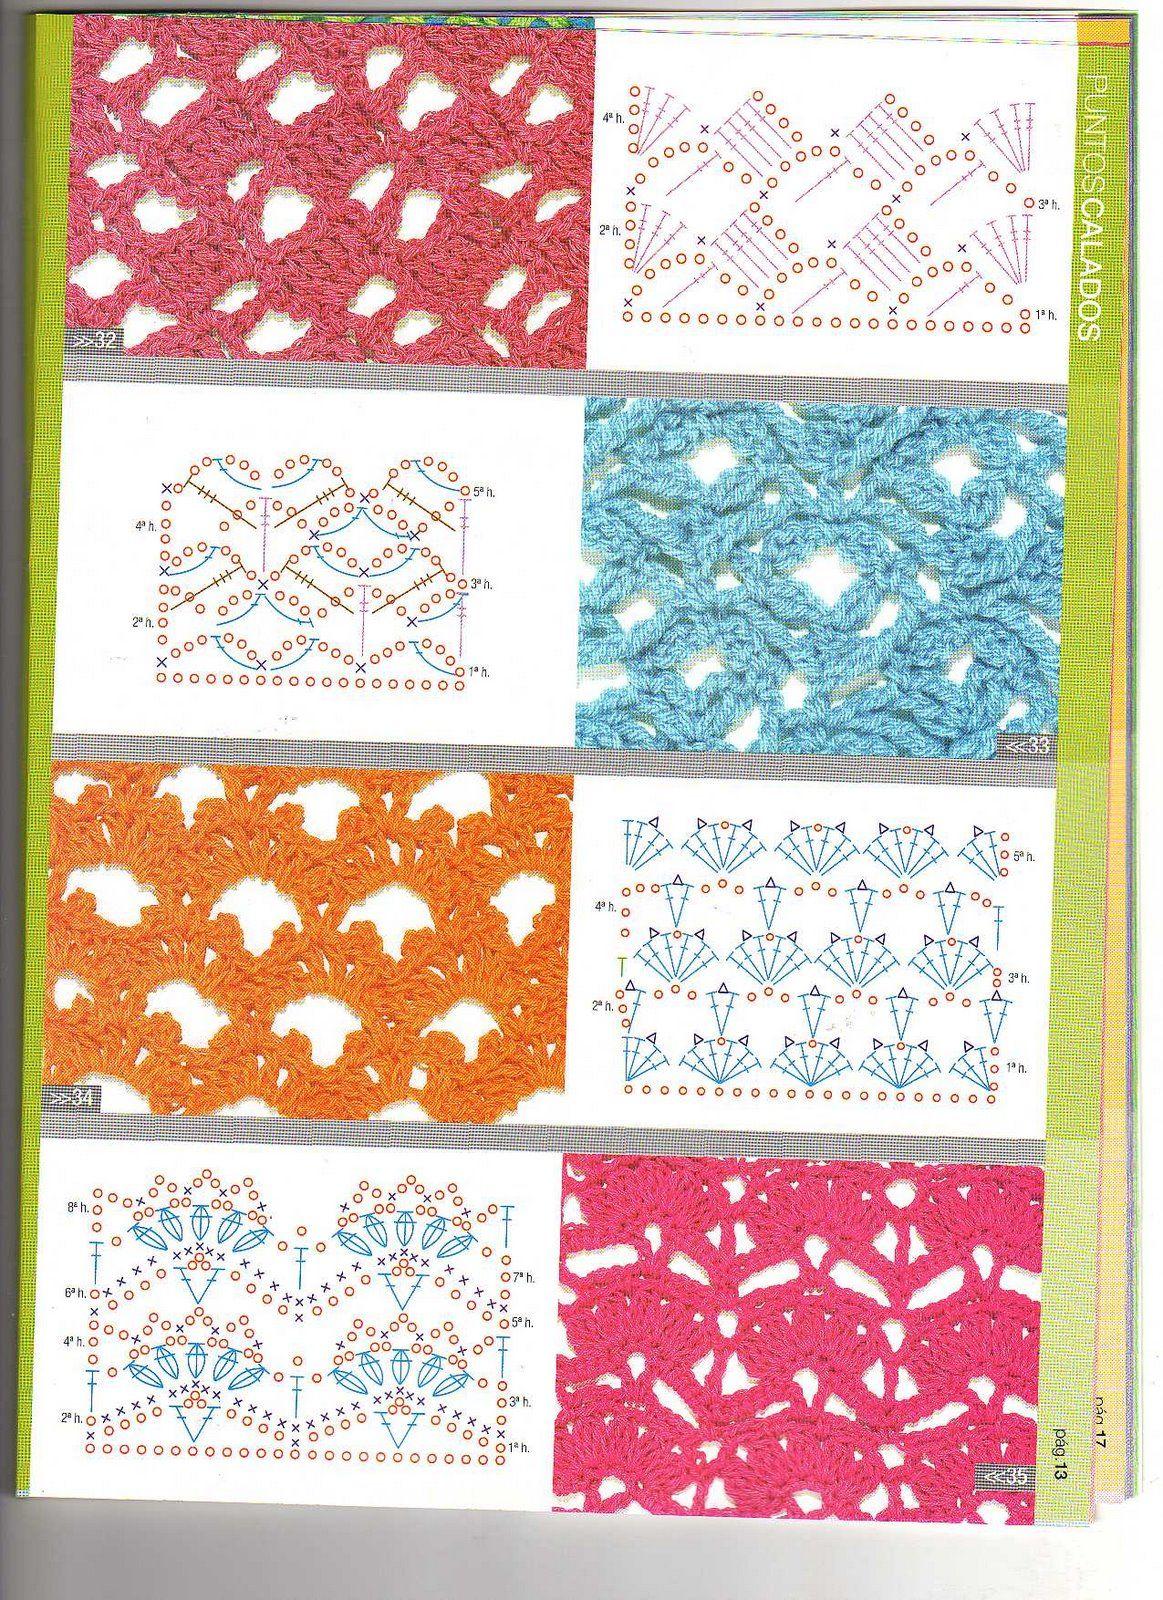 Solo puntos crochet puntos calados de todo crochet - Esquema punto estrella crochet ...